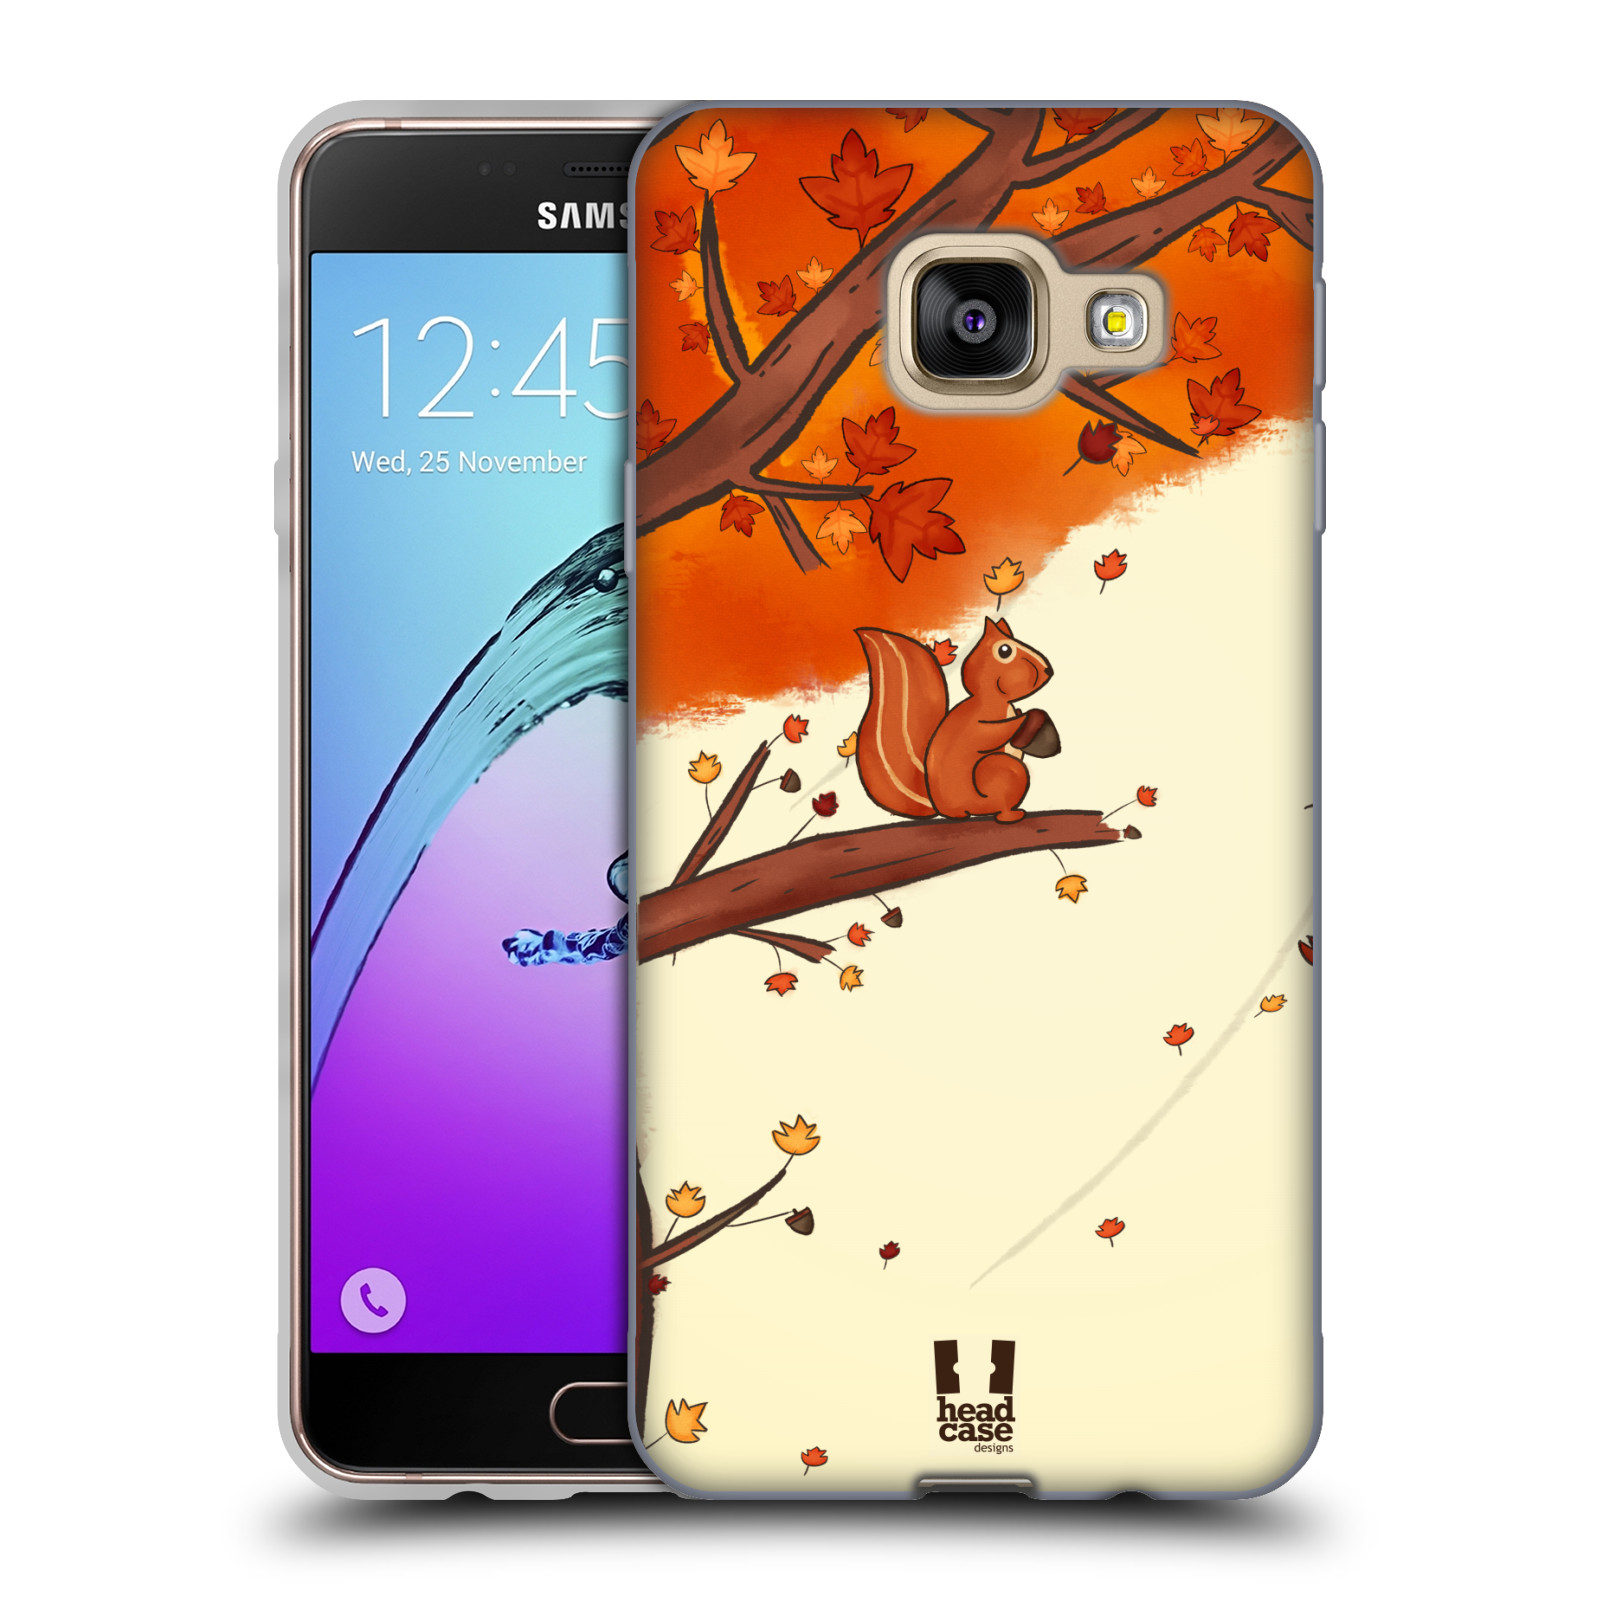 Silikonové pouzdro na mobil Samsung Galaxy A3 (2016) HEAD CASE PODZIMNÍ VEVERKA